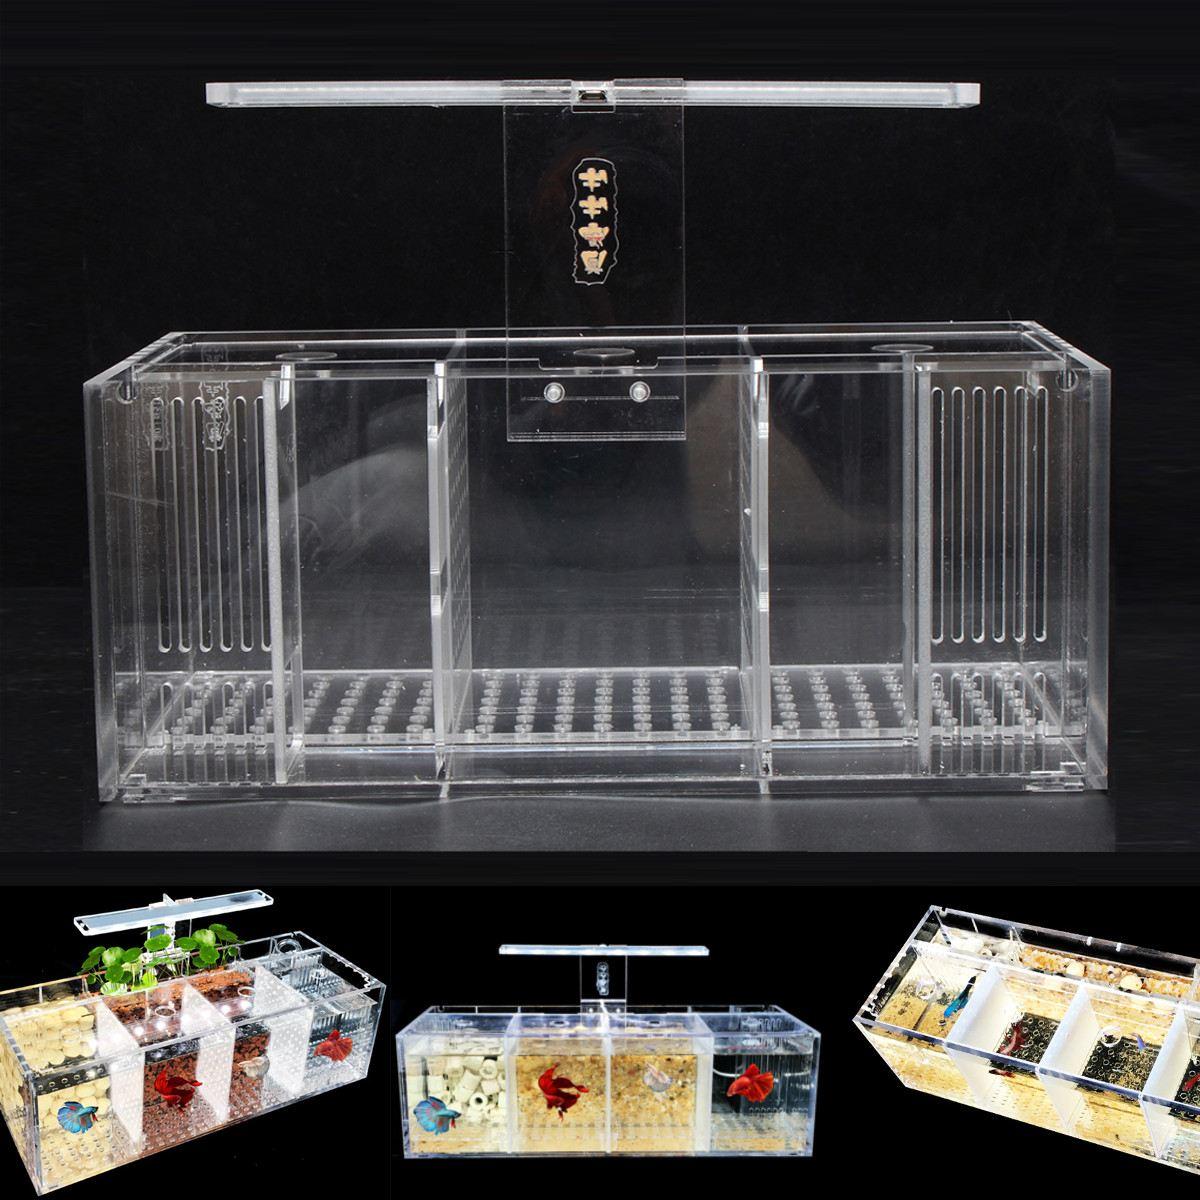 Aquarium Pet Betta Aquarium acrylique Transparent Isolation pompe à eau libre filtres clair seau Aquarium Mini lumière LED de bureau